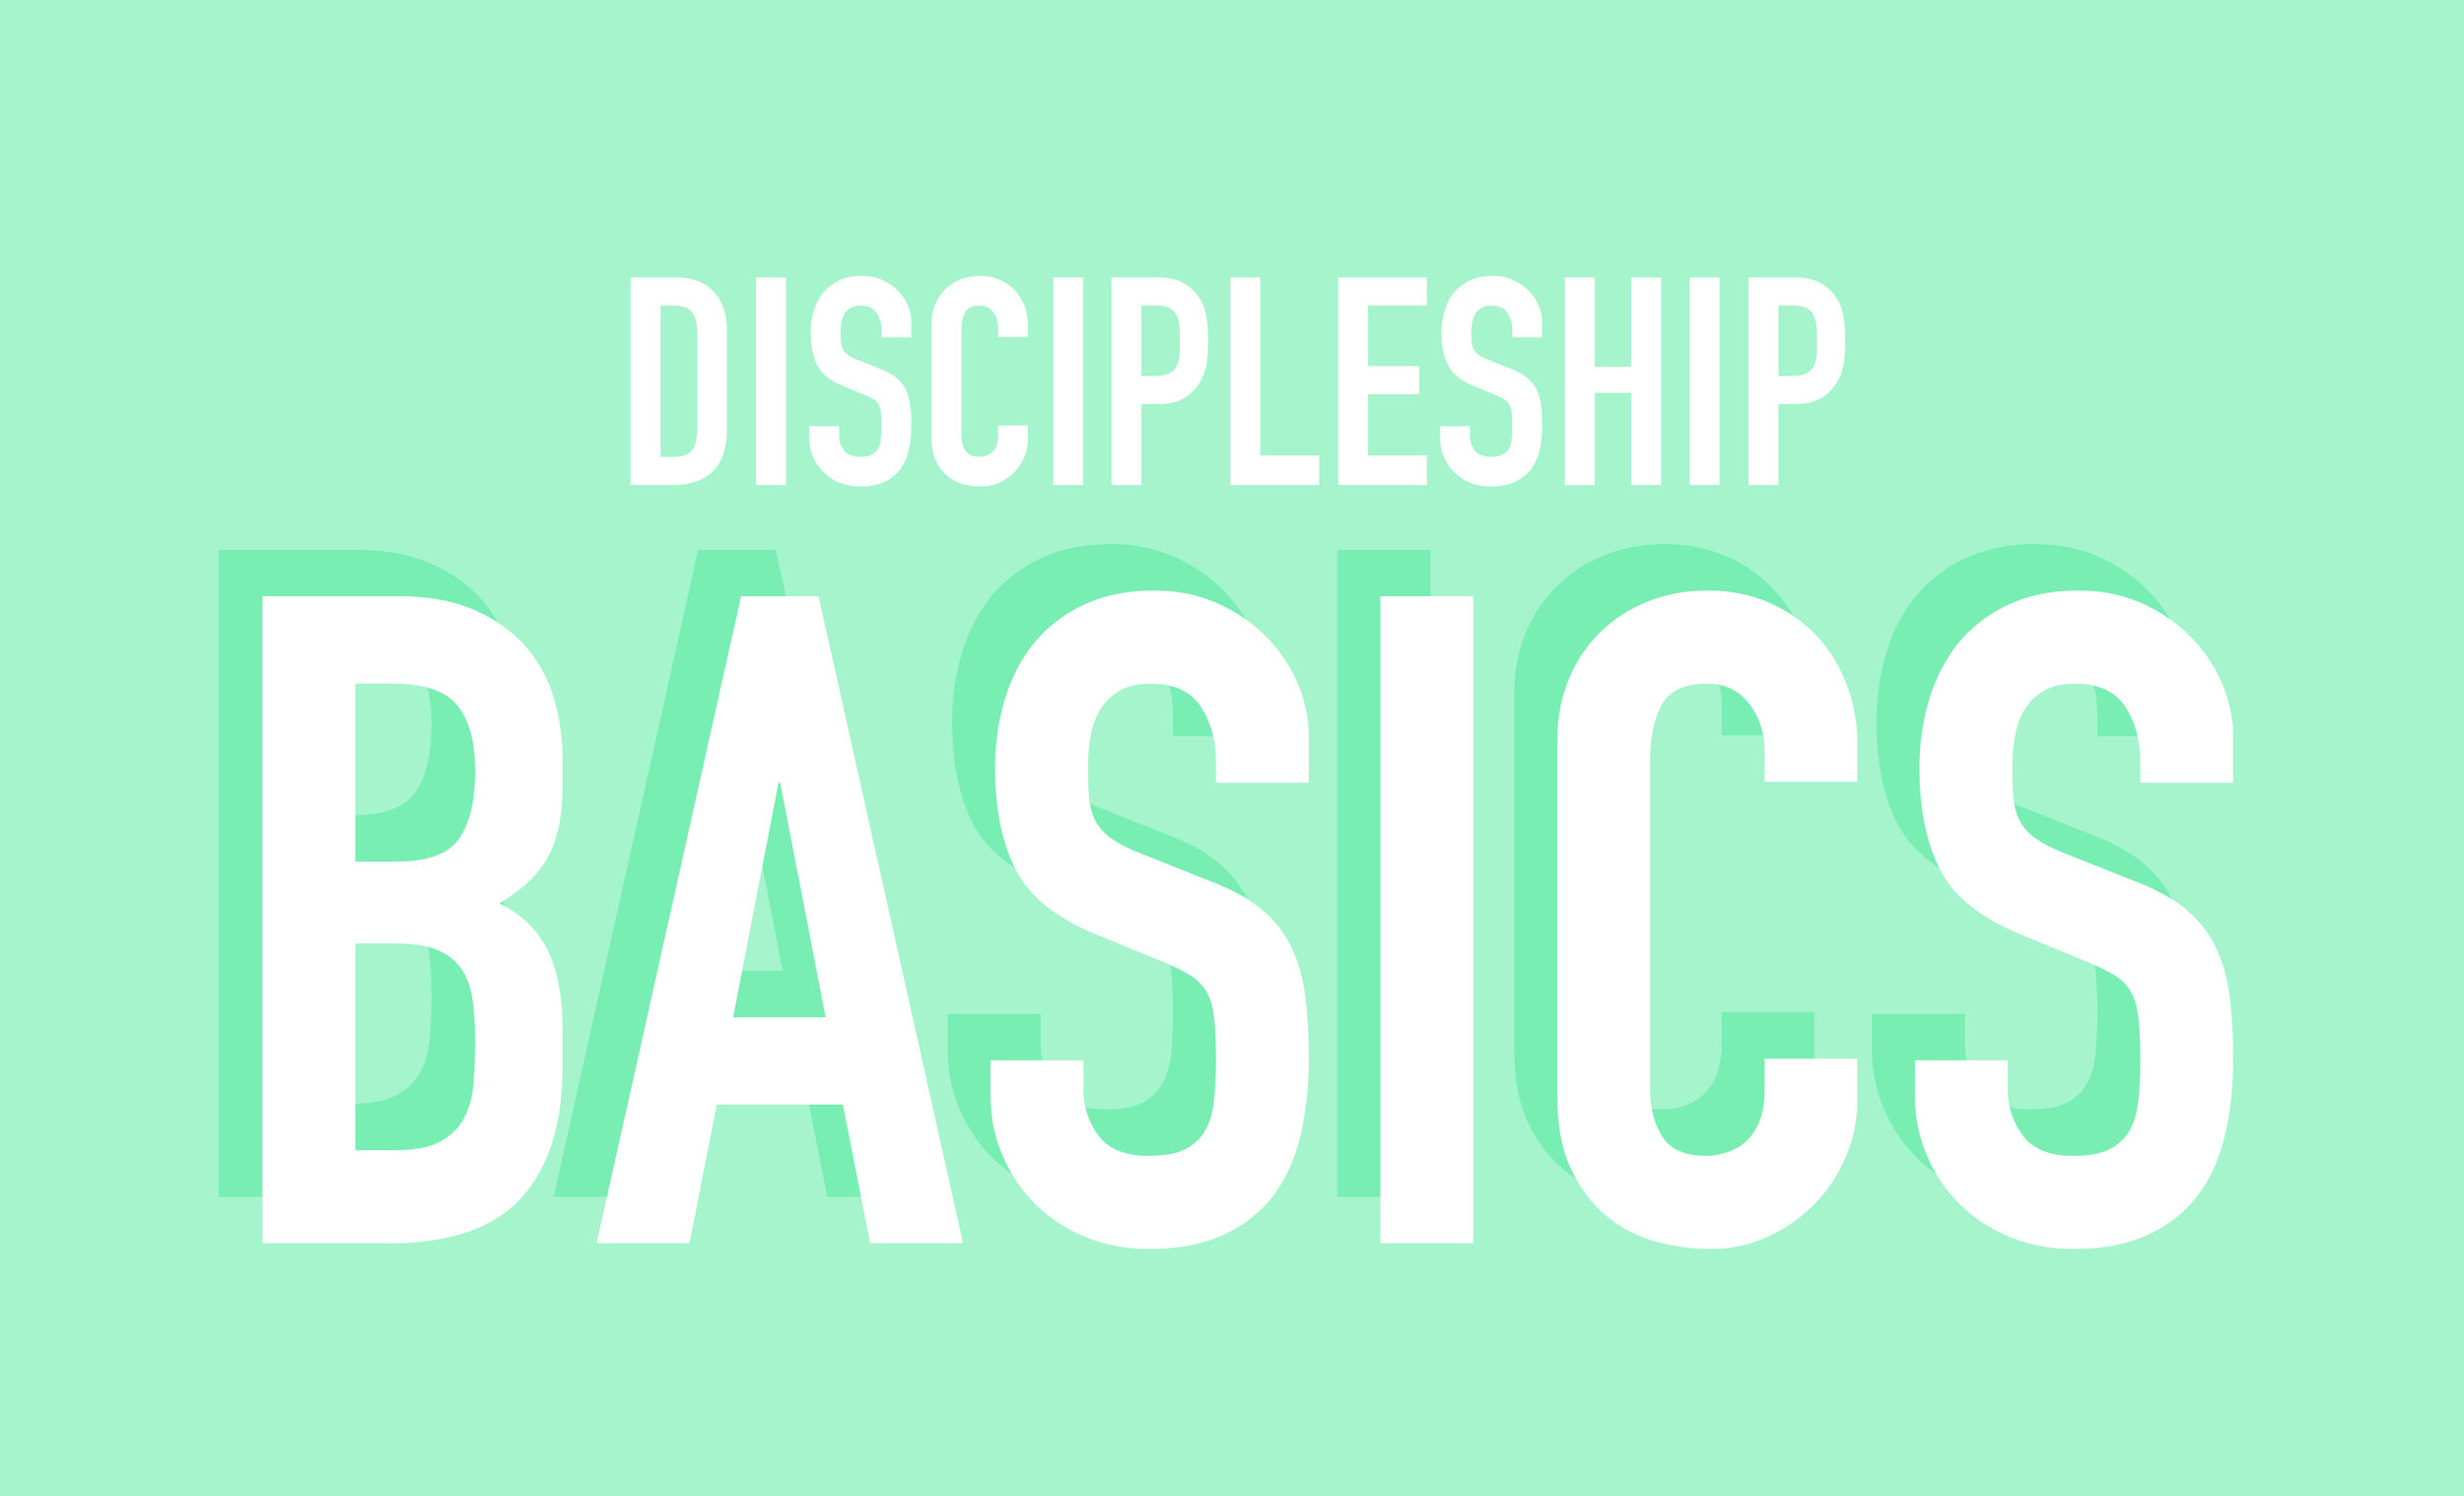 Discipleship Basics.jpg